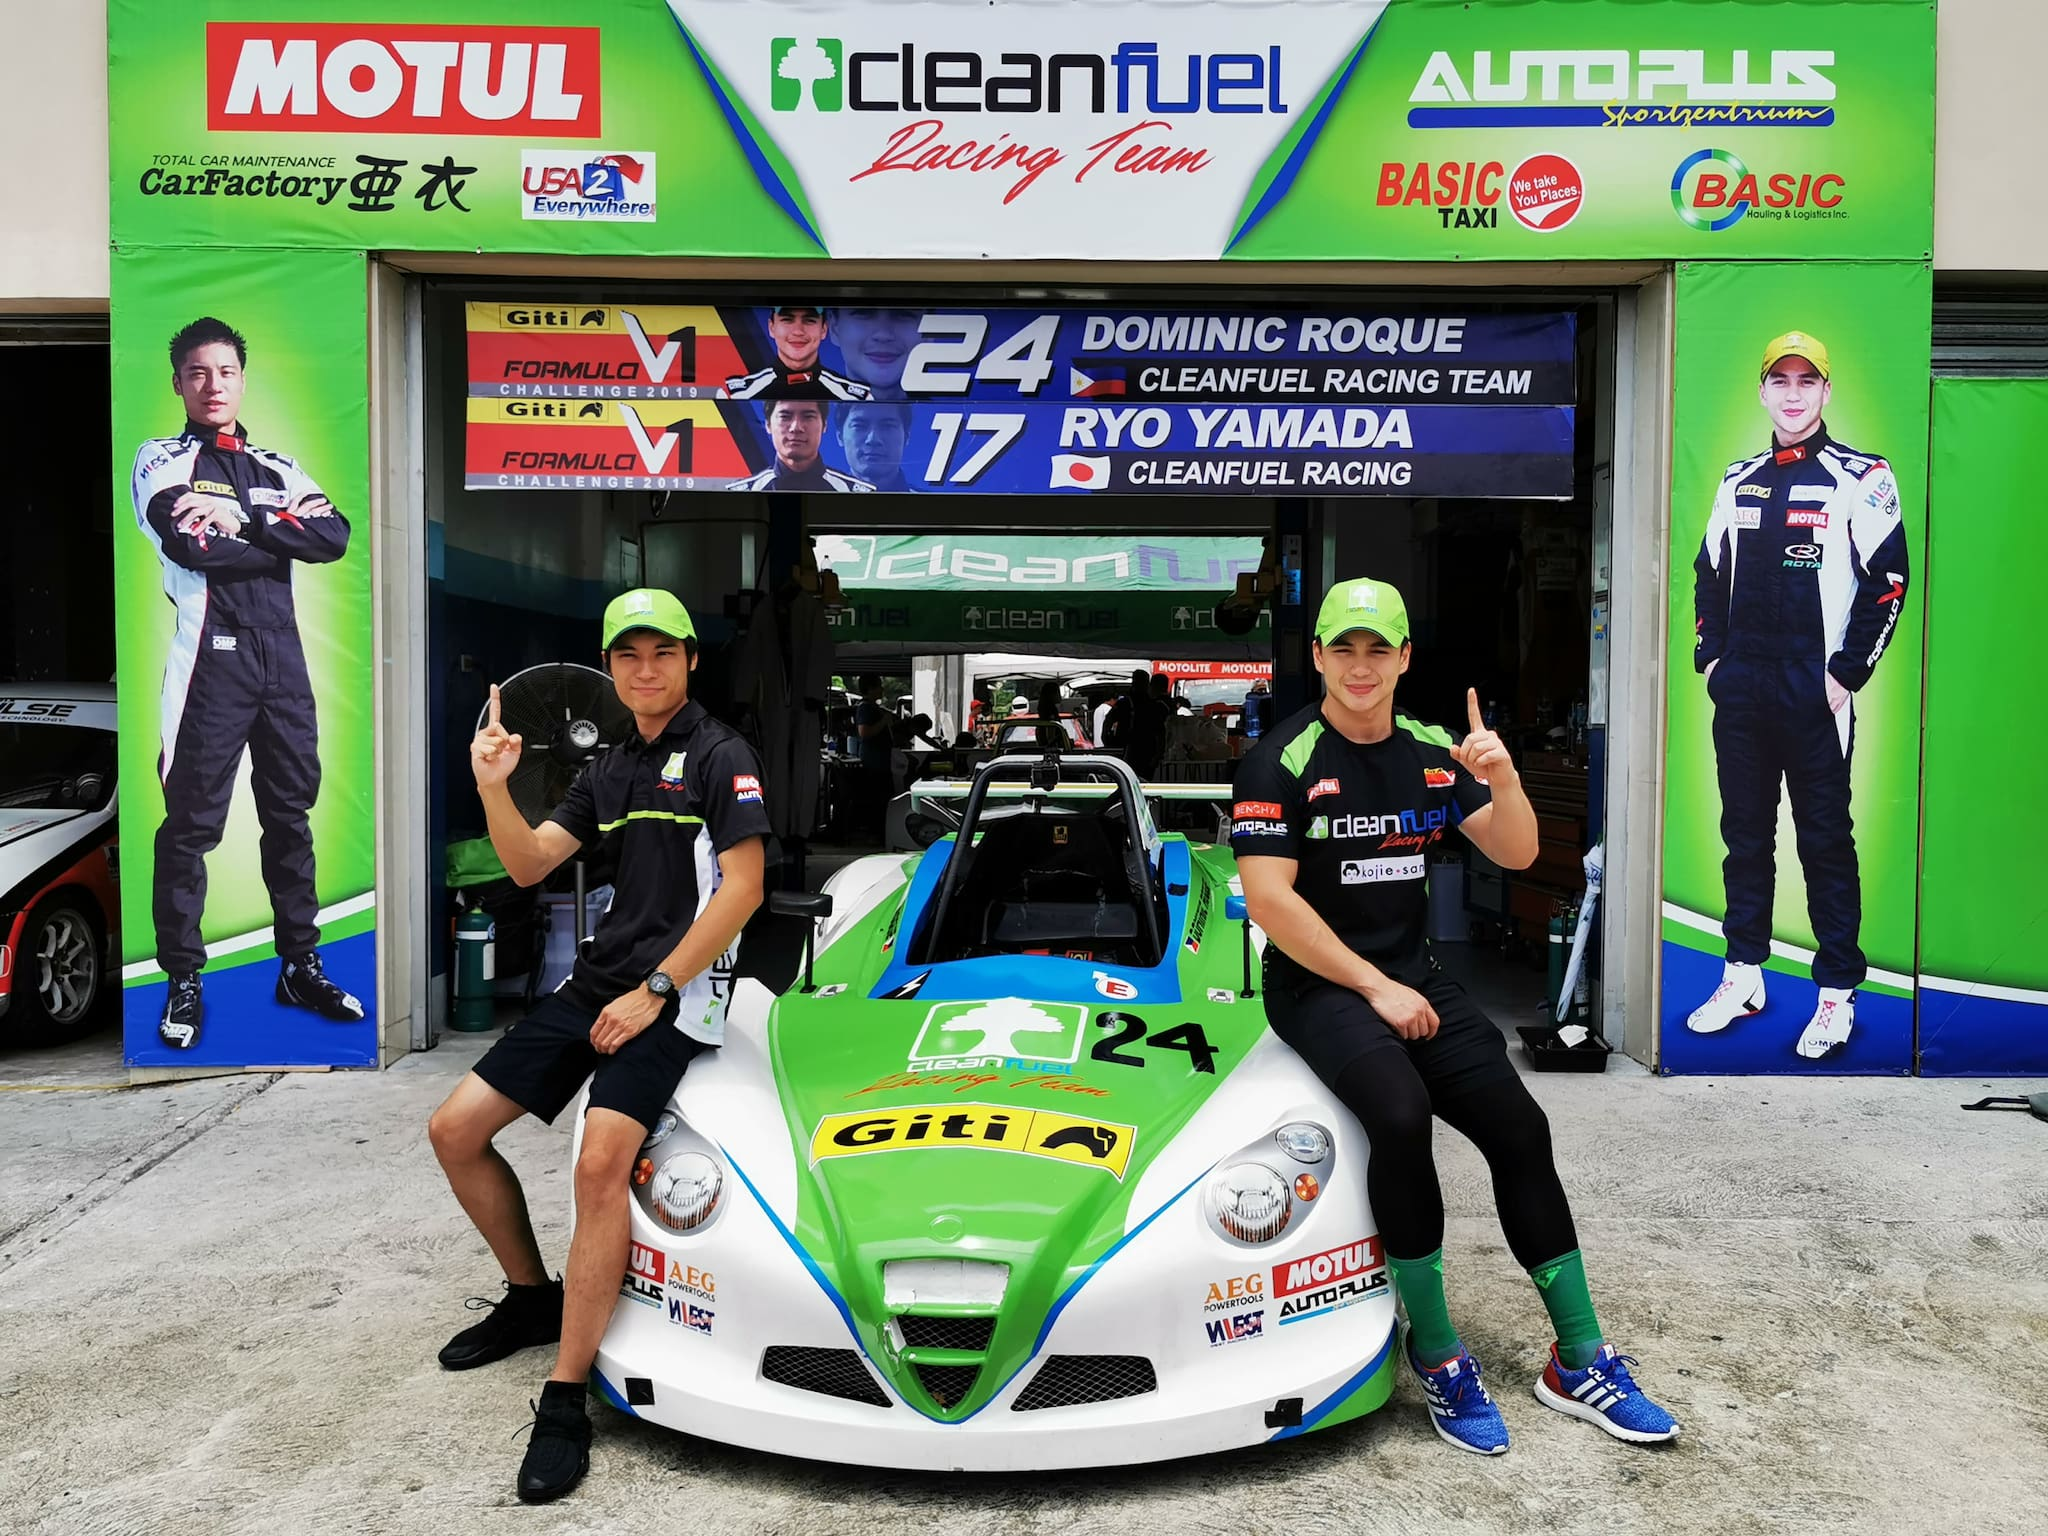 Cleanfuel-Motul's Roque Earns Premier Podium Place in 2019 Formula V1 Round 2